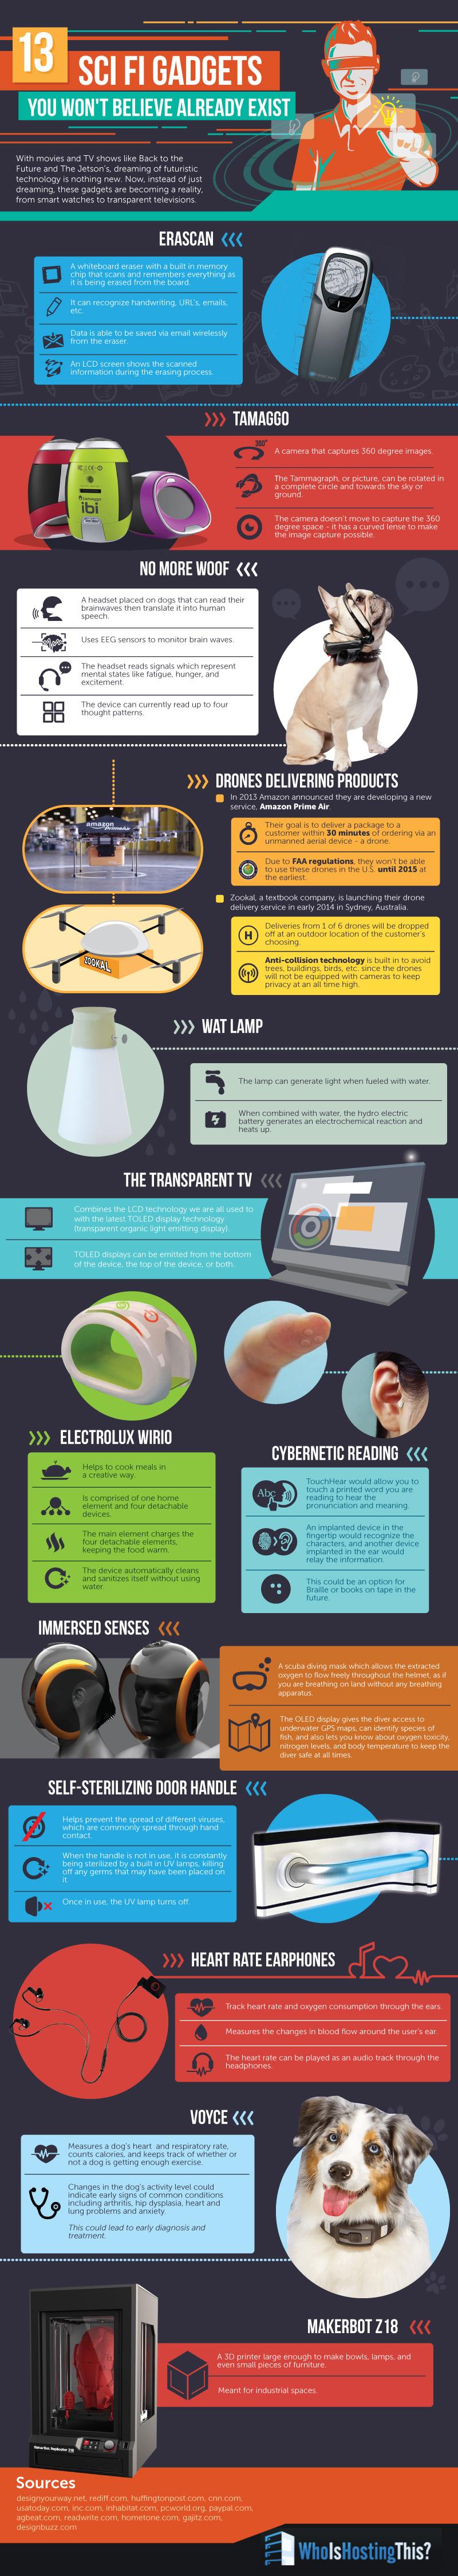 sci_fi_gadgets_you_wont_believe_exist_090914b3n